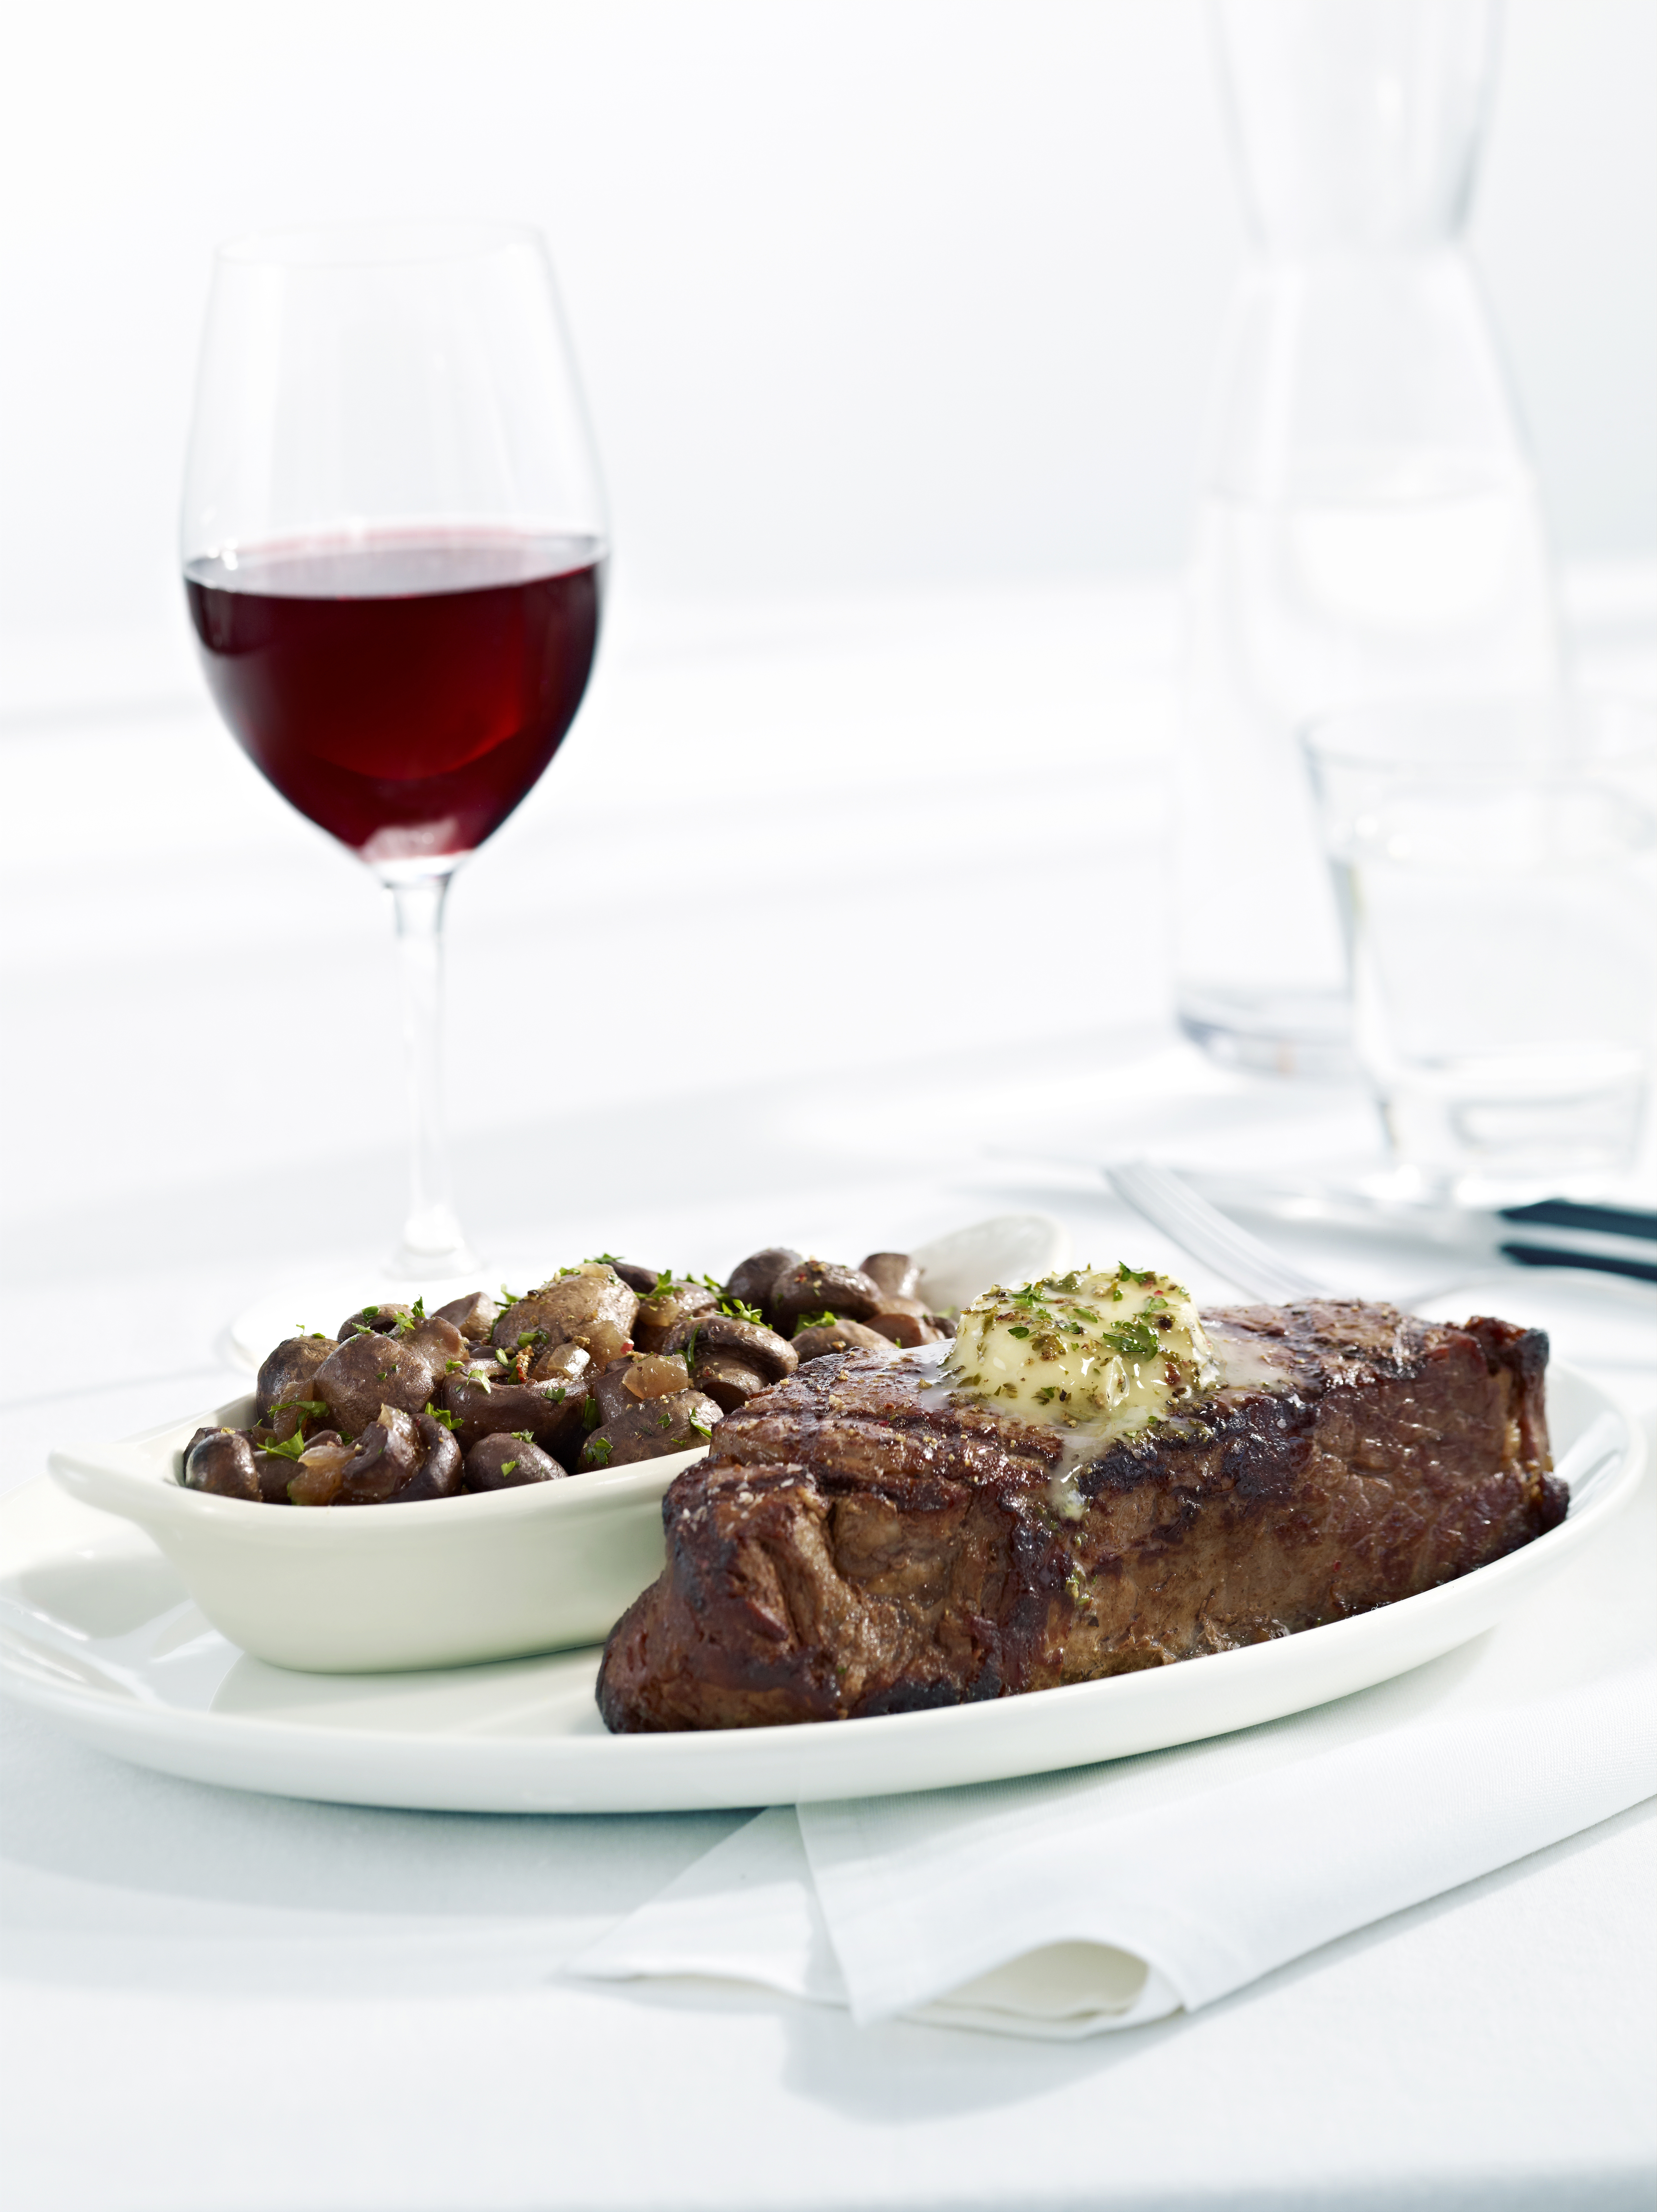 New York Strip Steak with Burgundy Button Mushrooms (Photo: Business Wire)